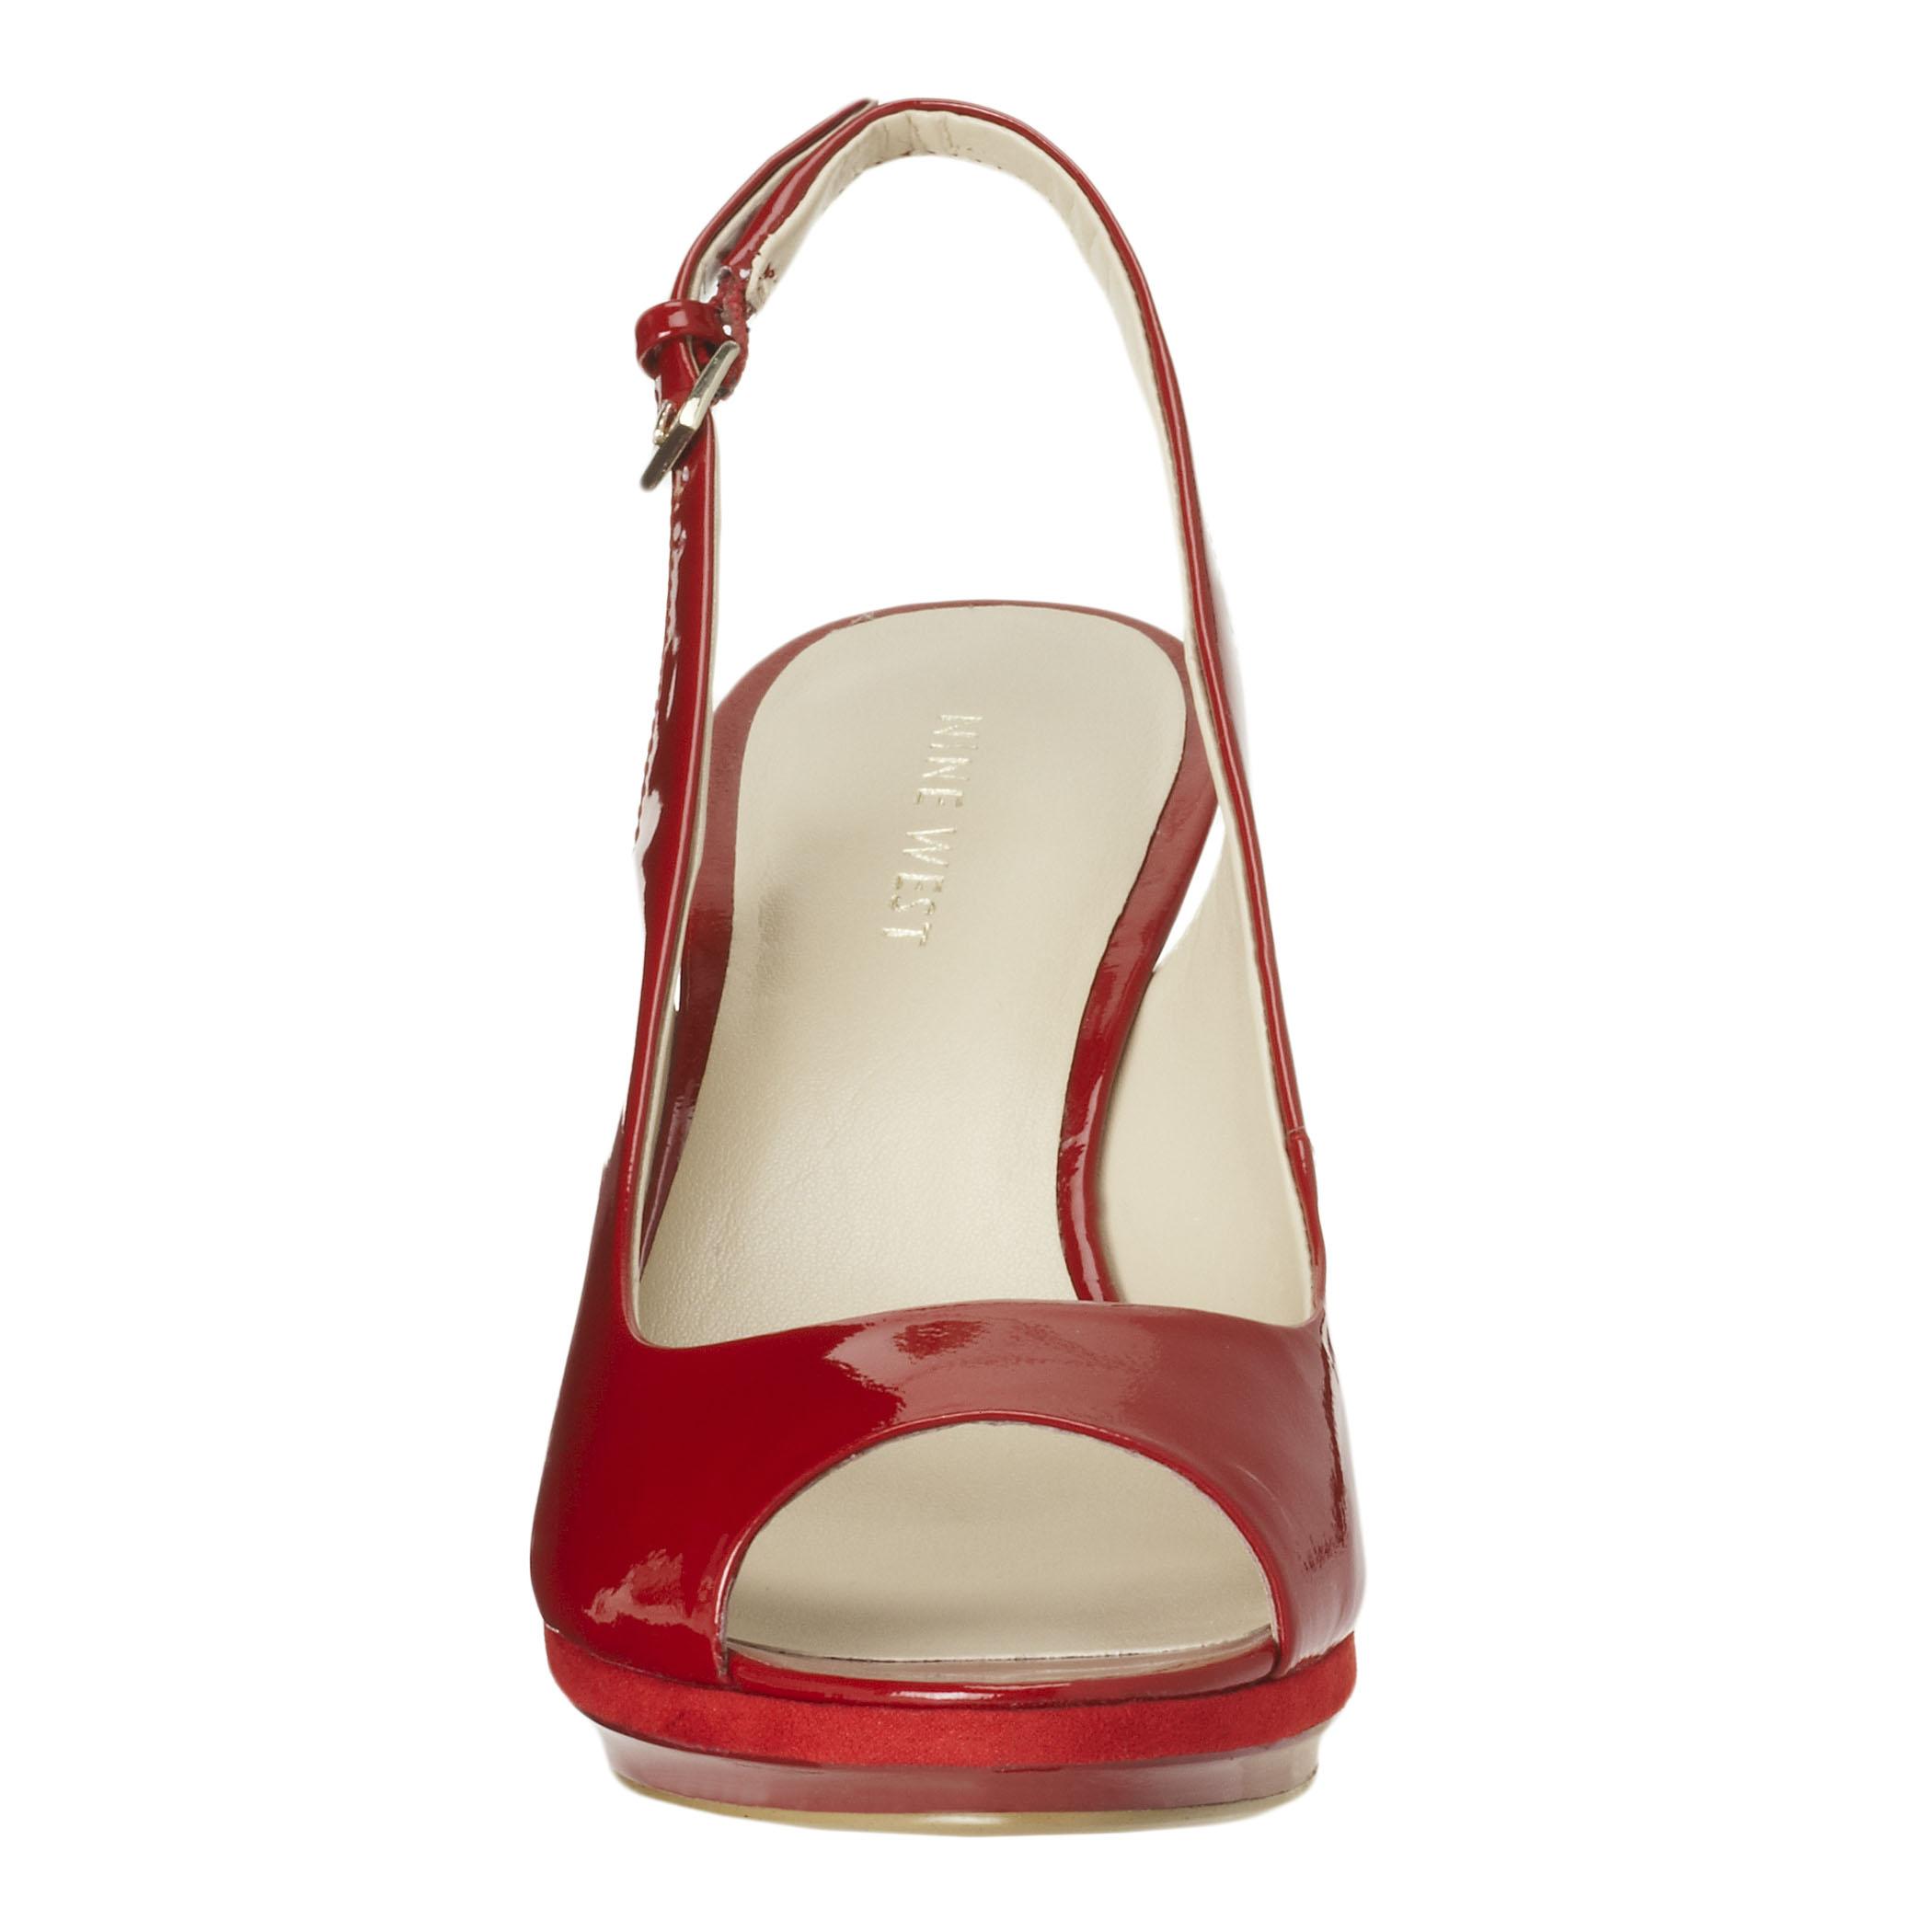 720db934b8b Lyst - Nine West Sharina Midheel Peep Toe Slingback in Red